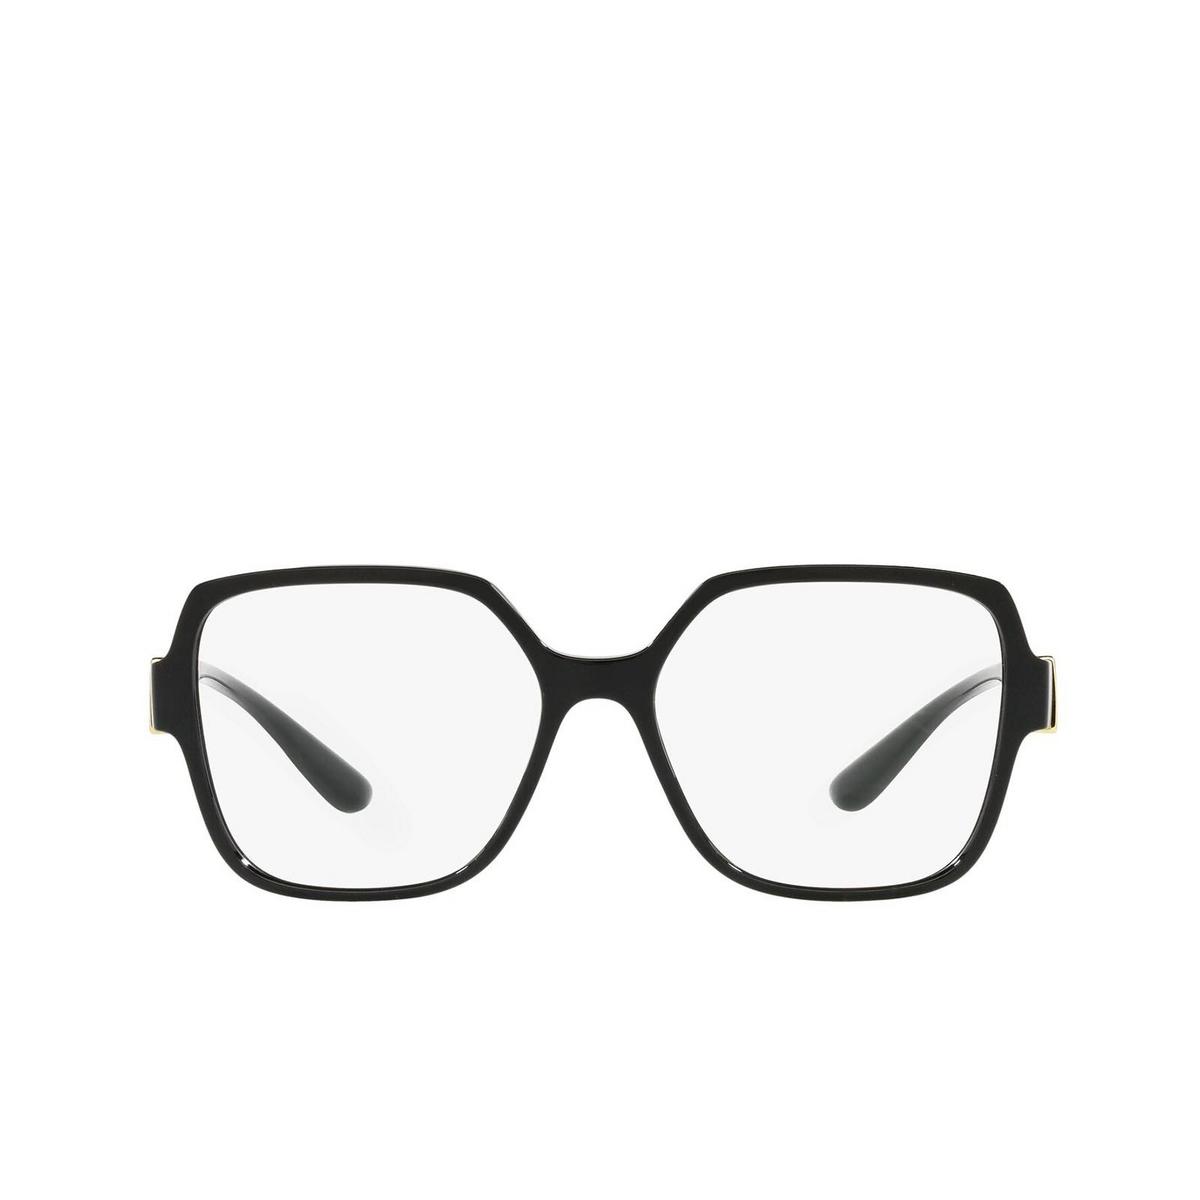 Dolce & Gabbana® Square Eyeglasses: DG5065 color Black 501 - front view.